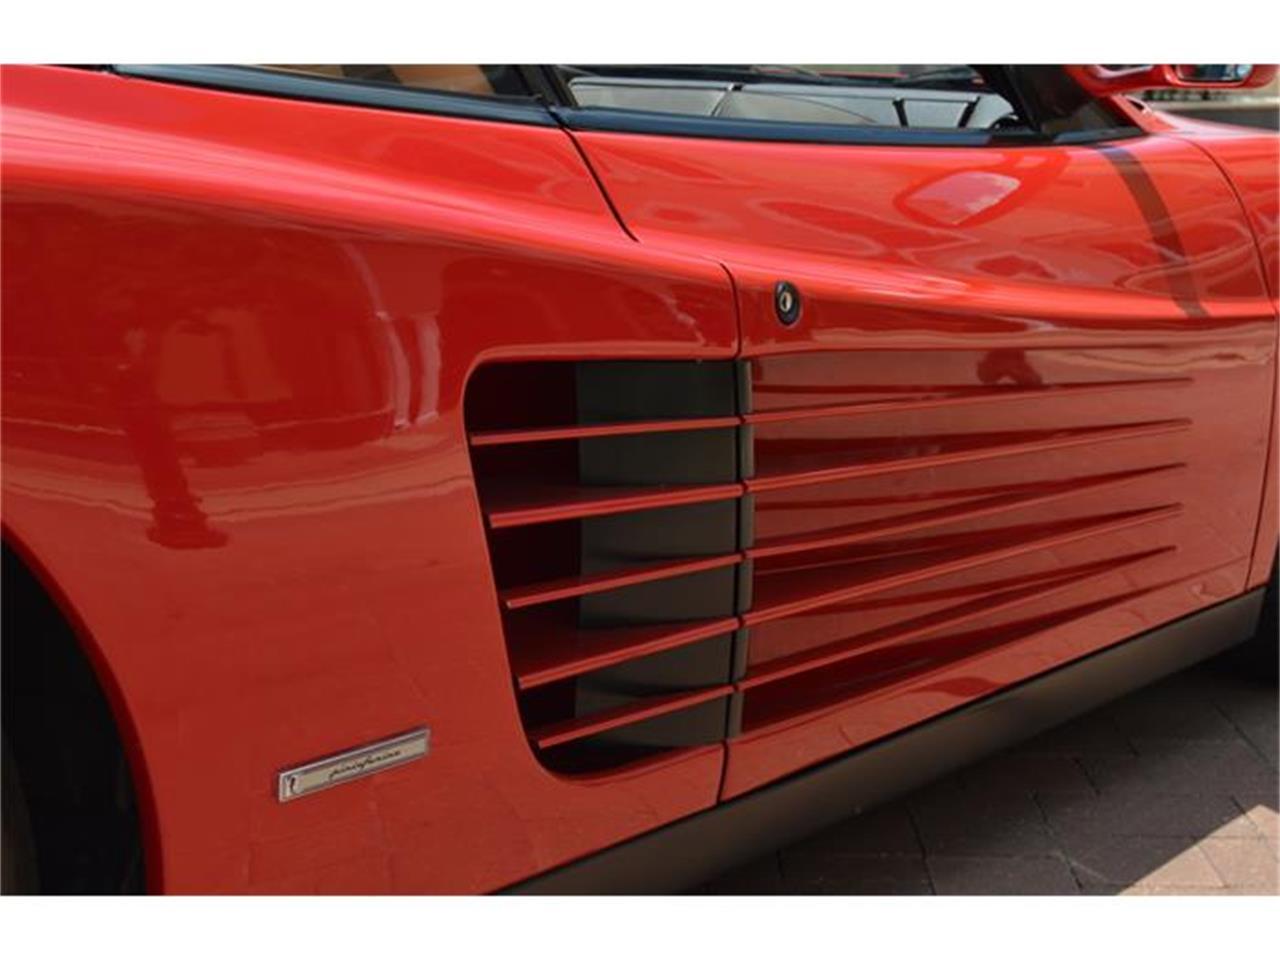 Large Picture of 1990 Ferrari Testarossa located in Texas Auction Vehicle - GMC4